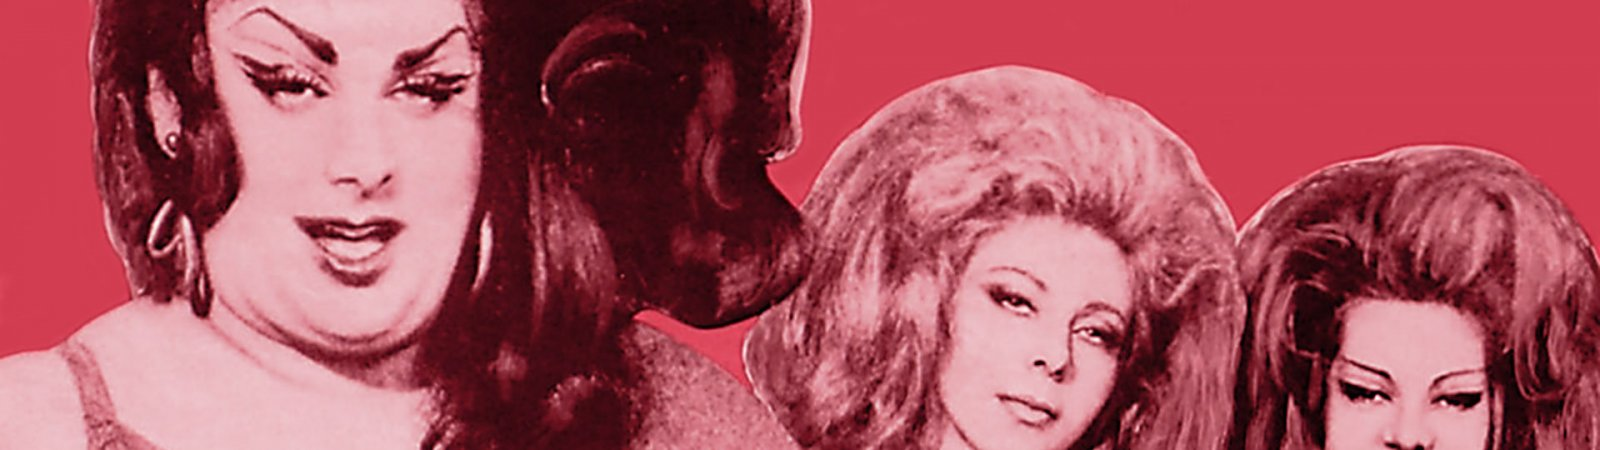 Photo du film : Female trouble